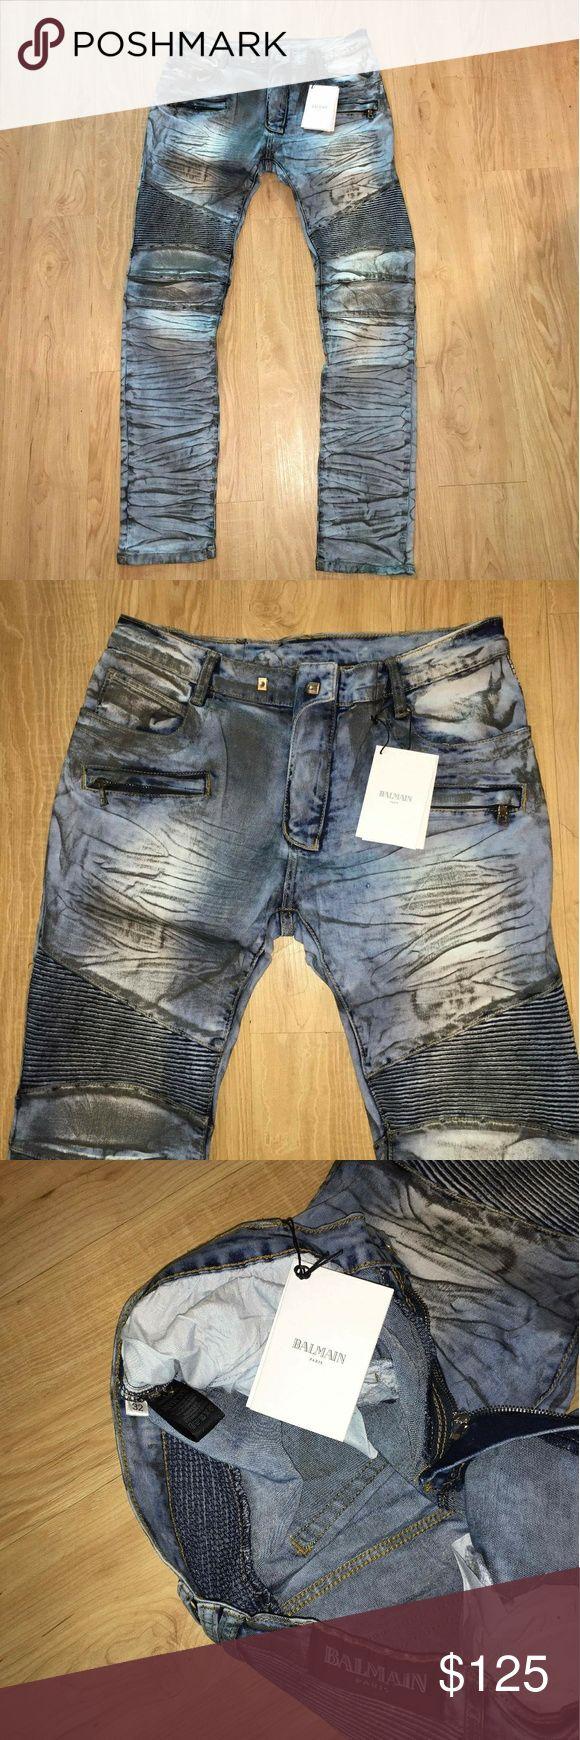 Balmain biker jeans New  Size 32  Fast 2-3 days priority shipping Balmain Jeans Slim Straight